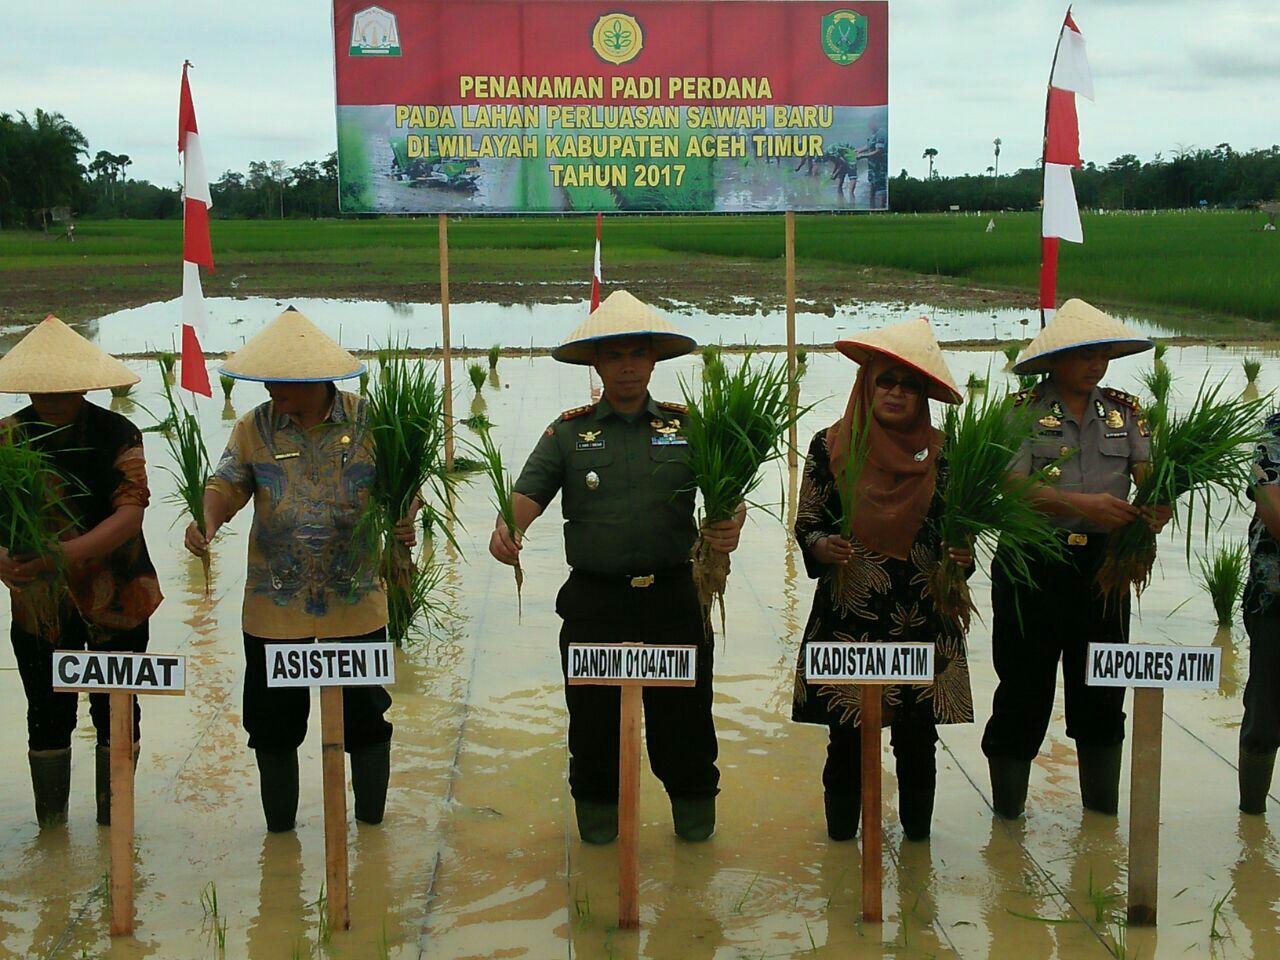 Wagub Aceh: Ketersediaan Listrik Dorong Pembangunan Ekonomi Aceh